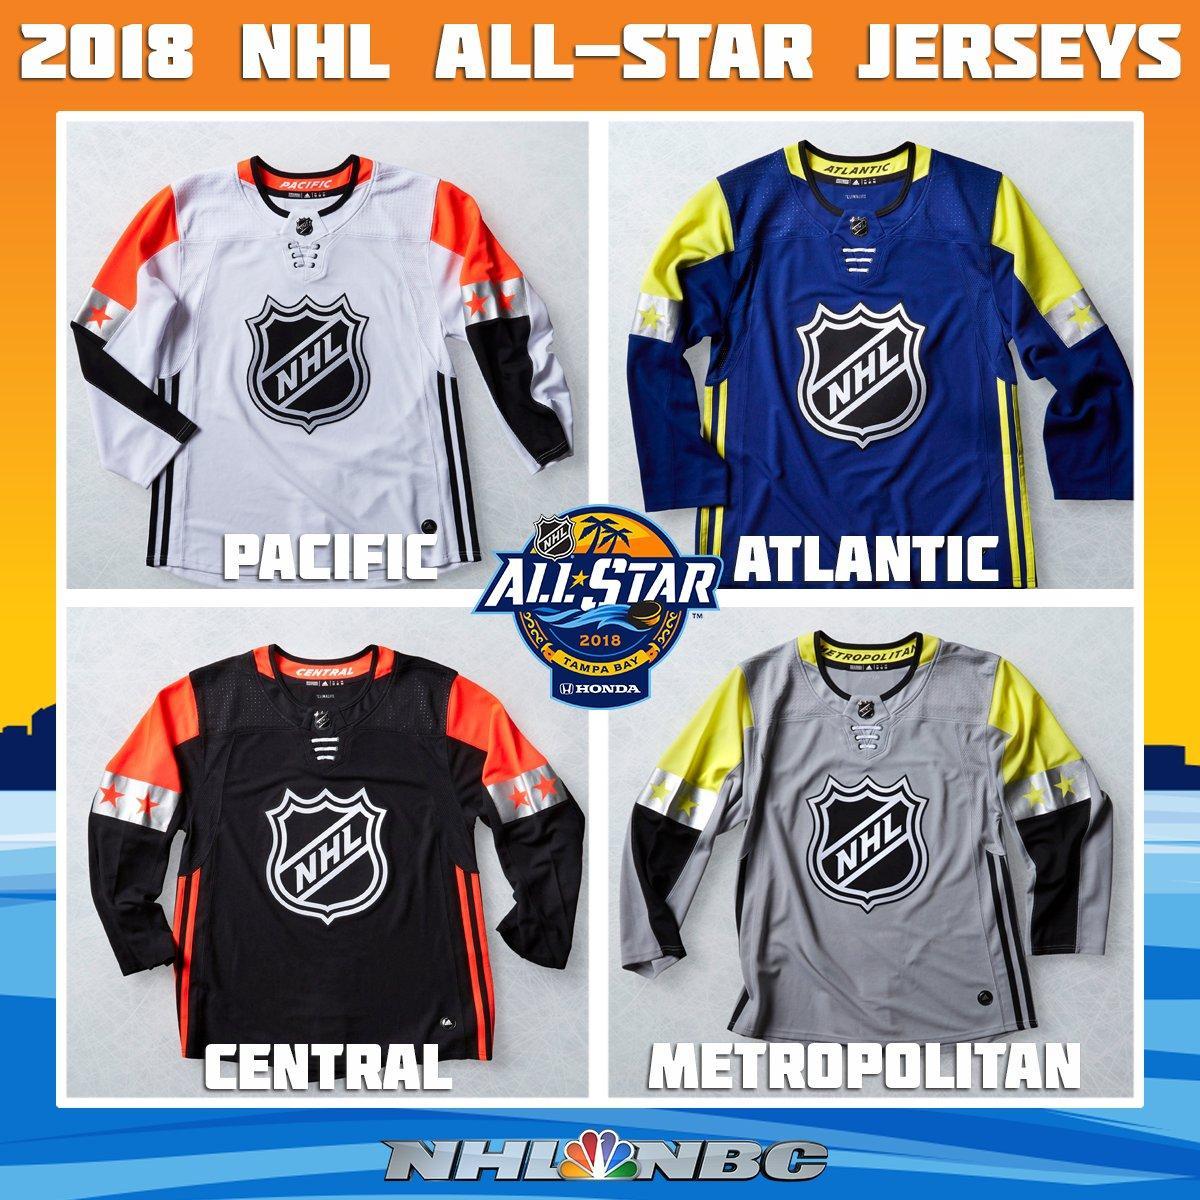 new styles 0a7f5 03573 NBC Sports on Twitter: